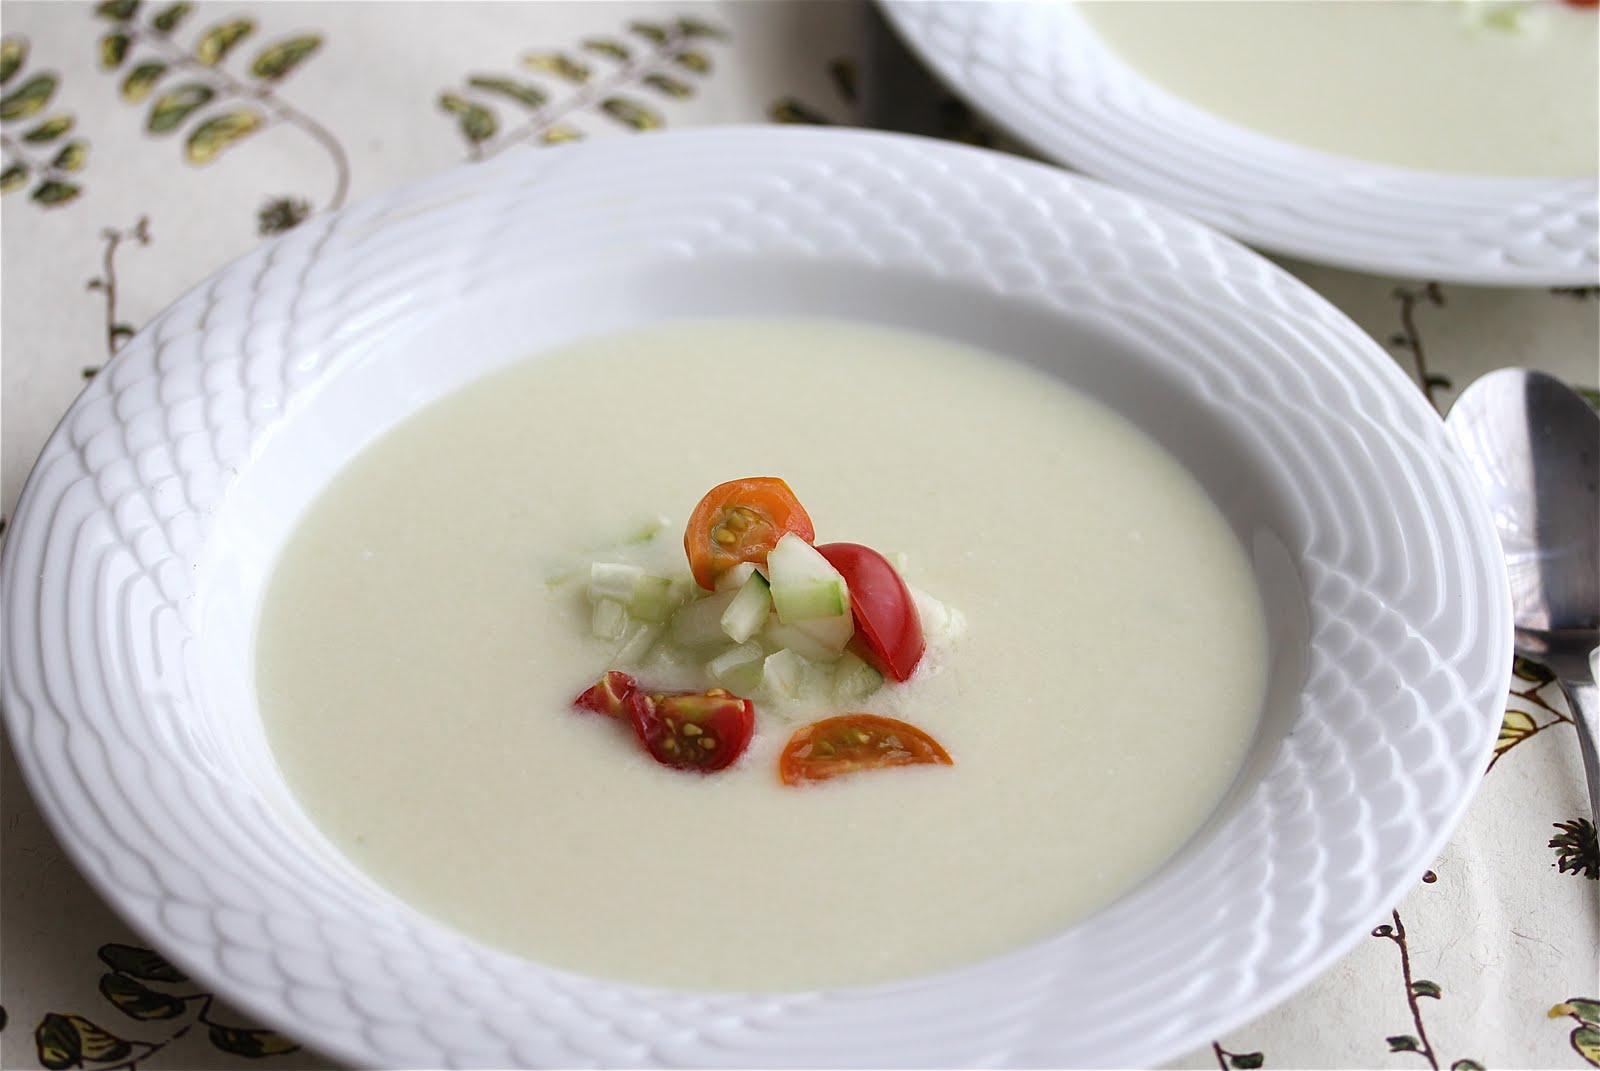 Madhur Jaffrey's Cold Cucumber Soup